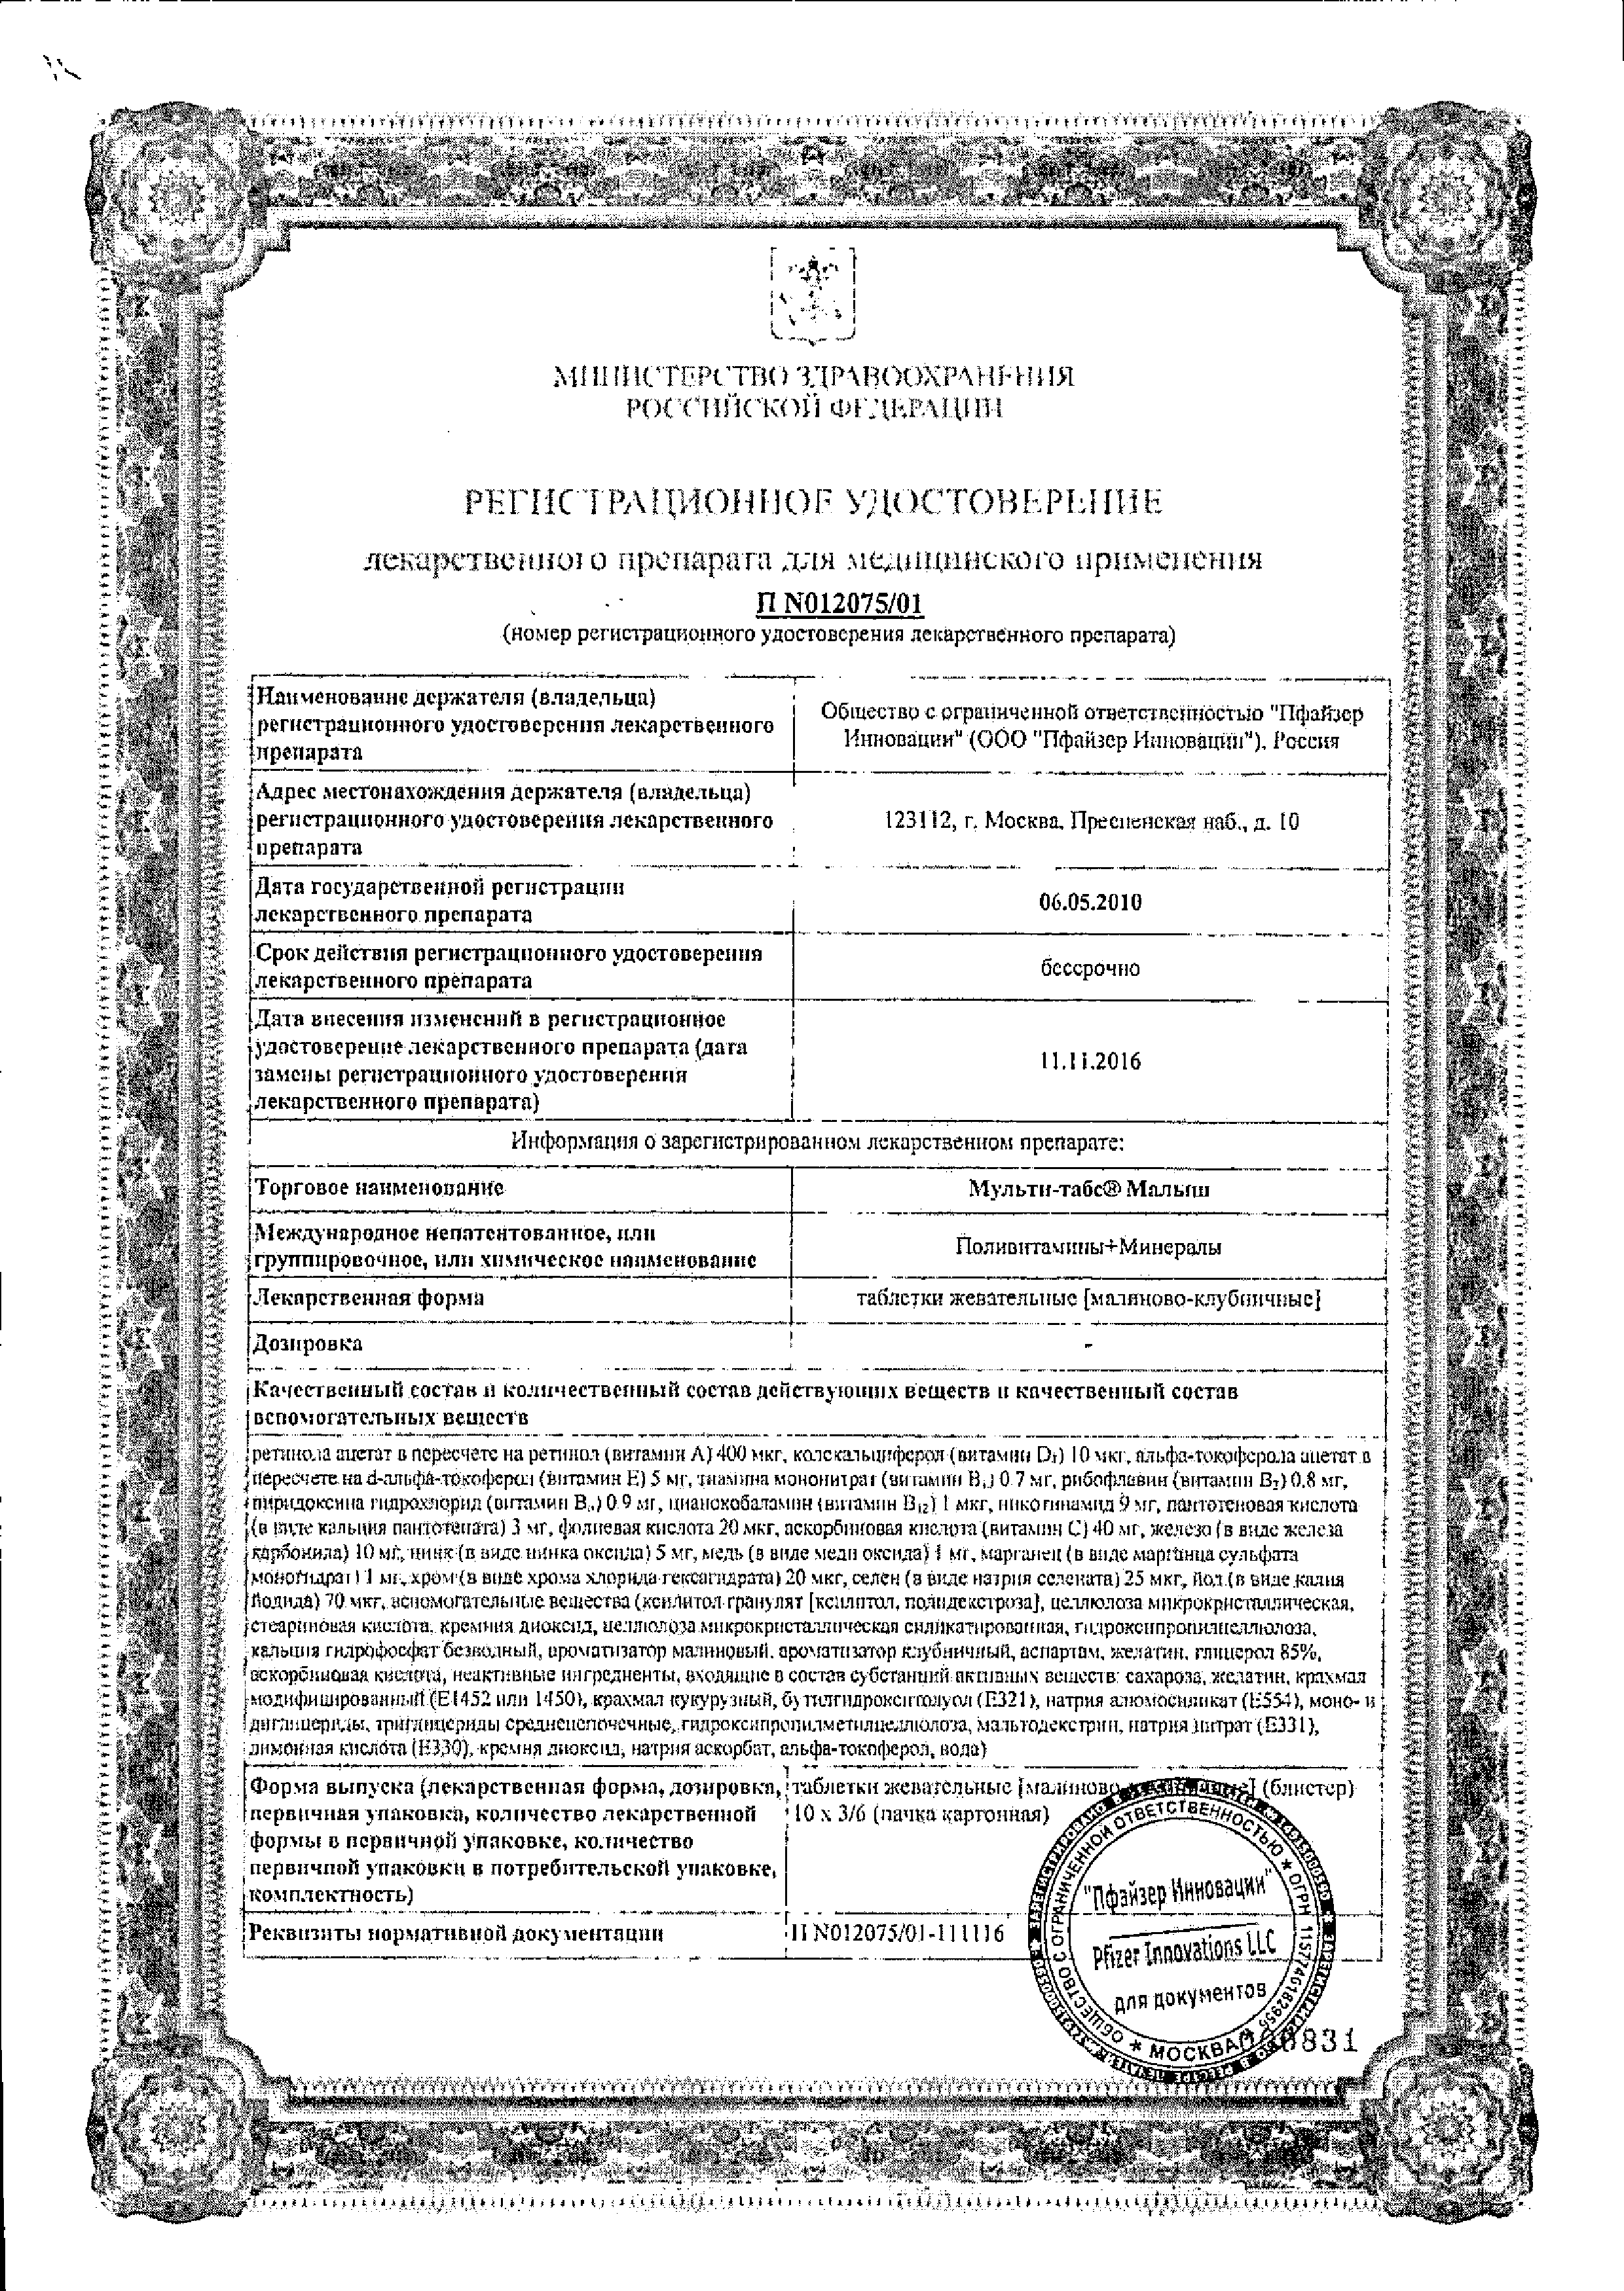 Мульти-табс Малыш сертификат